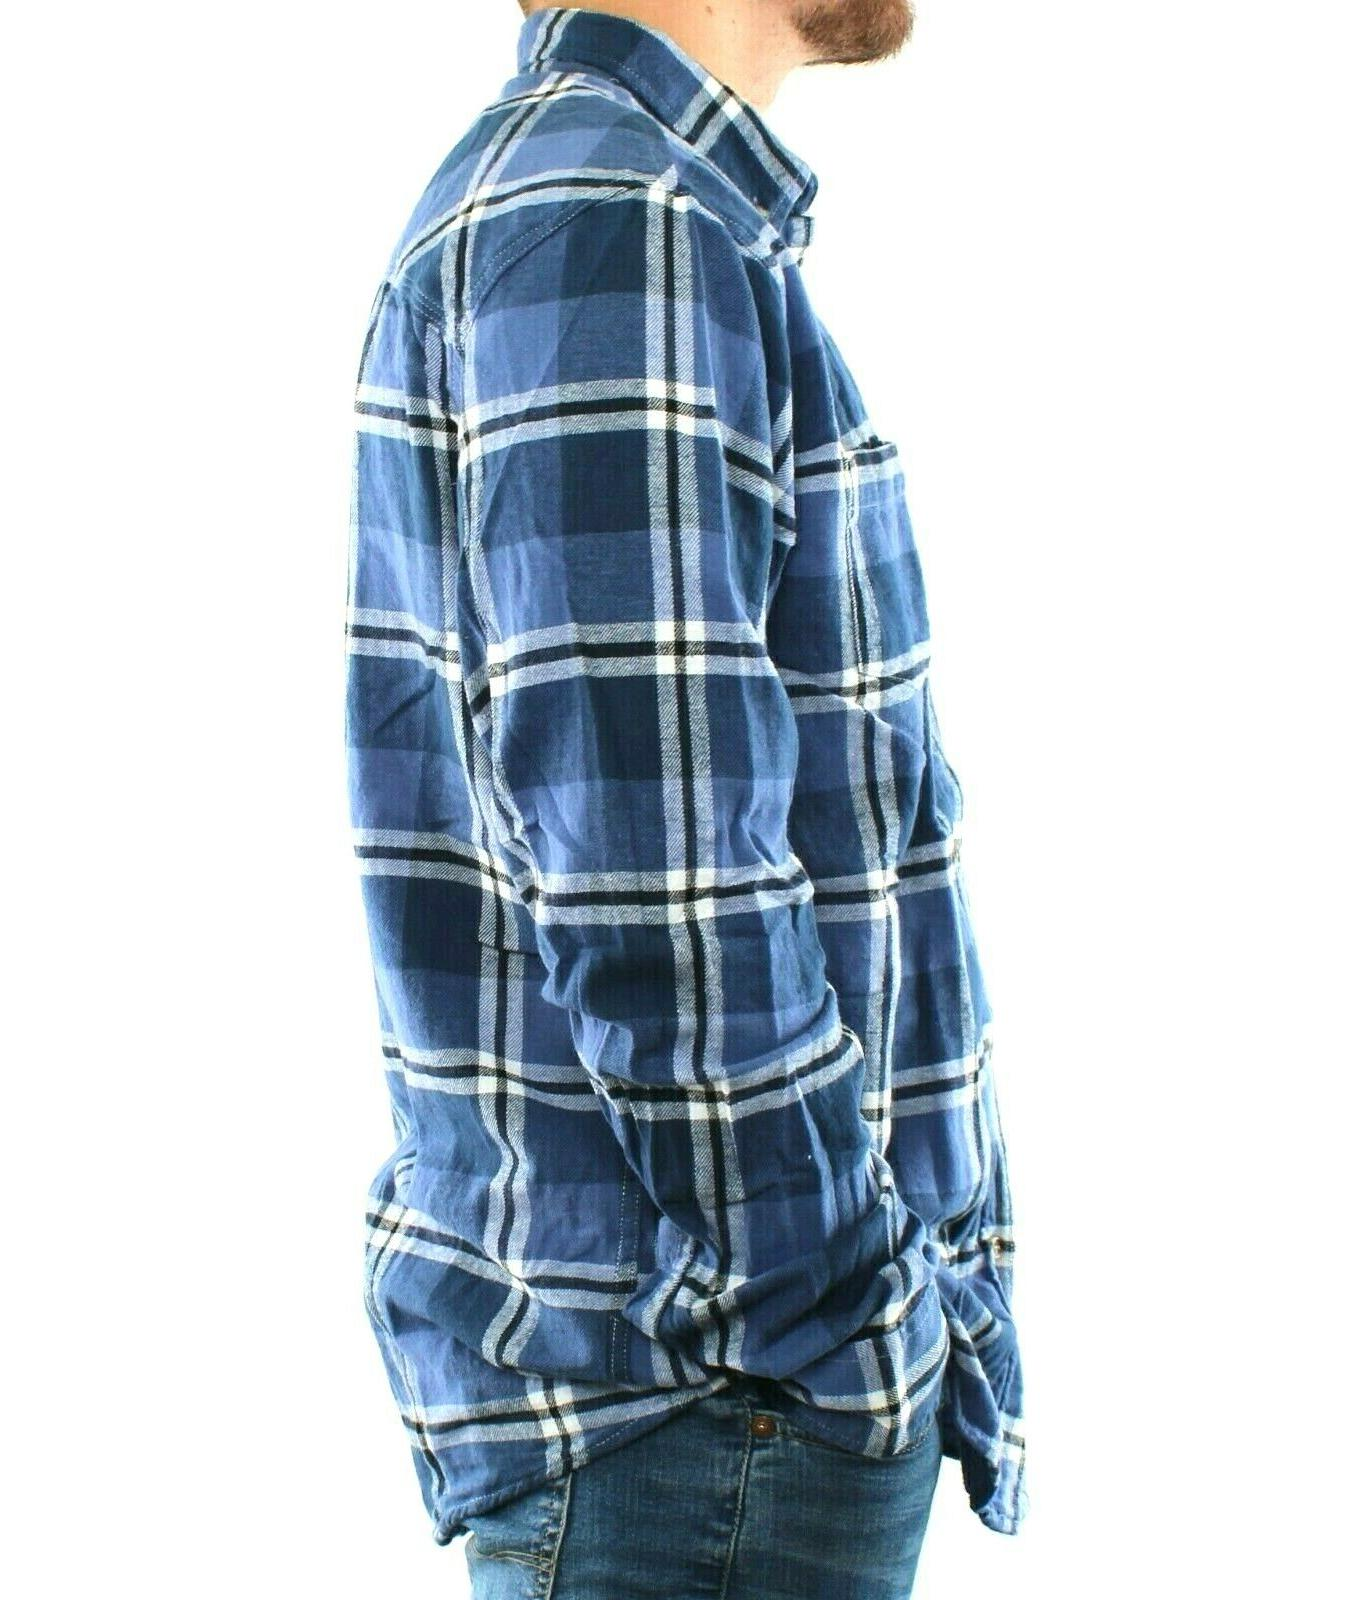 St. Johns Shirt Sleeve